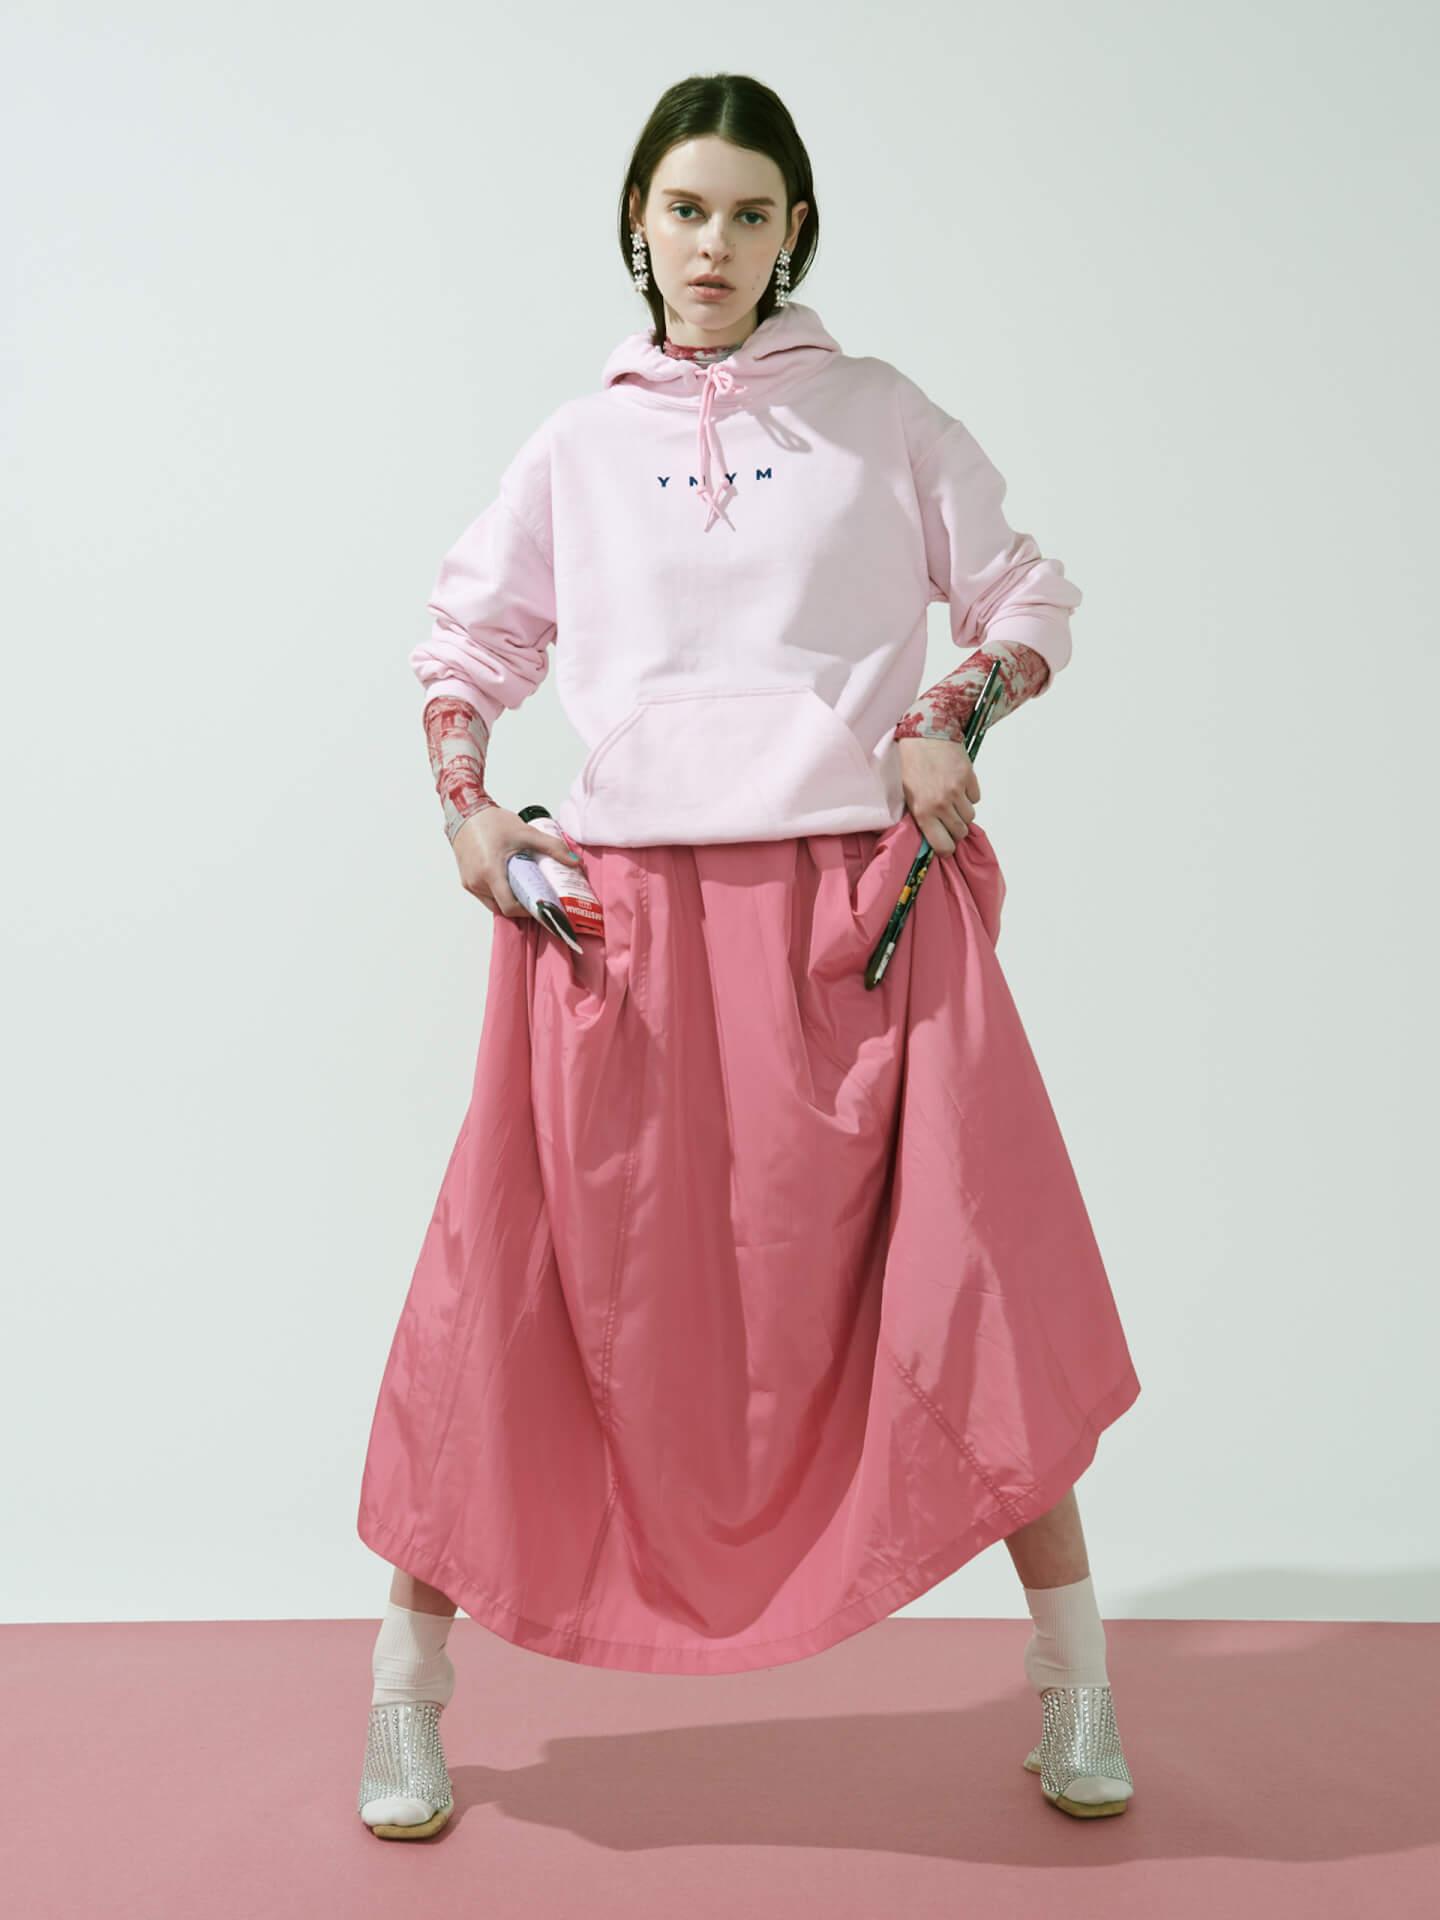 CHAIのベーシスト・YUUKIによるプロジェクト「YMYM」よりファッションブランドオープン!2021年春夏コレクション&描き下ろし絵画などの展示会も life210405_ymym_4